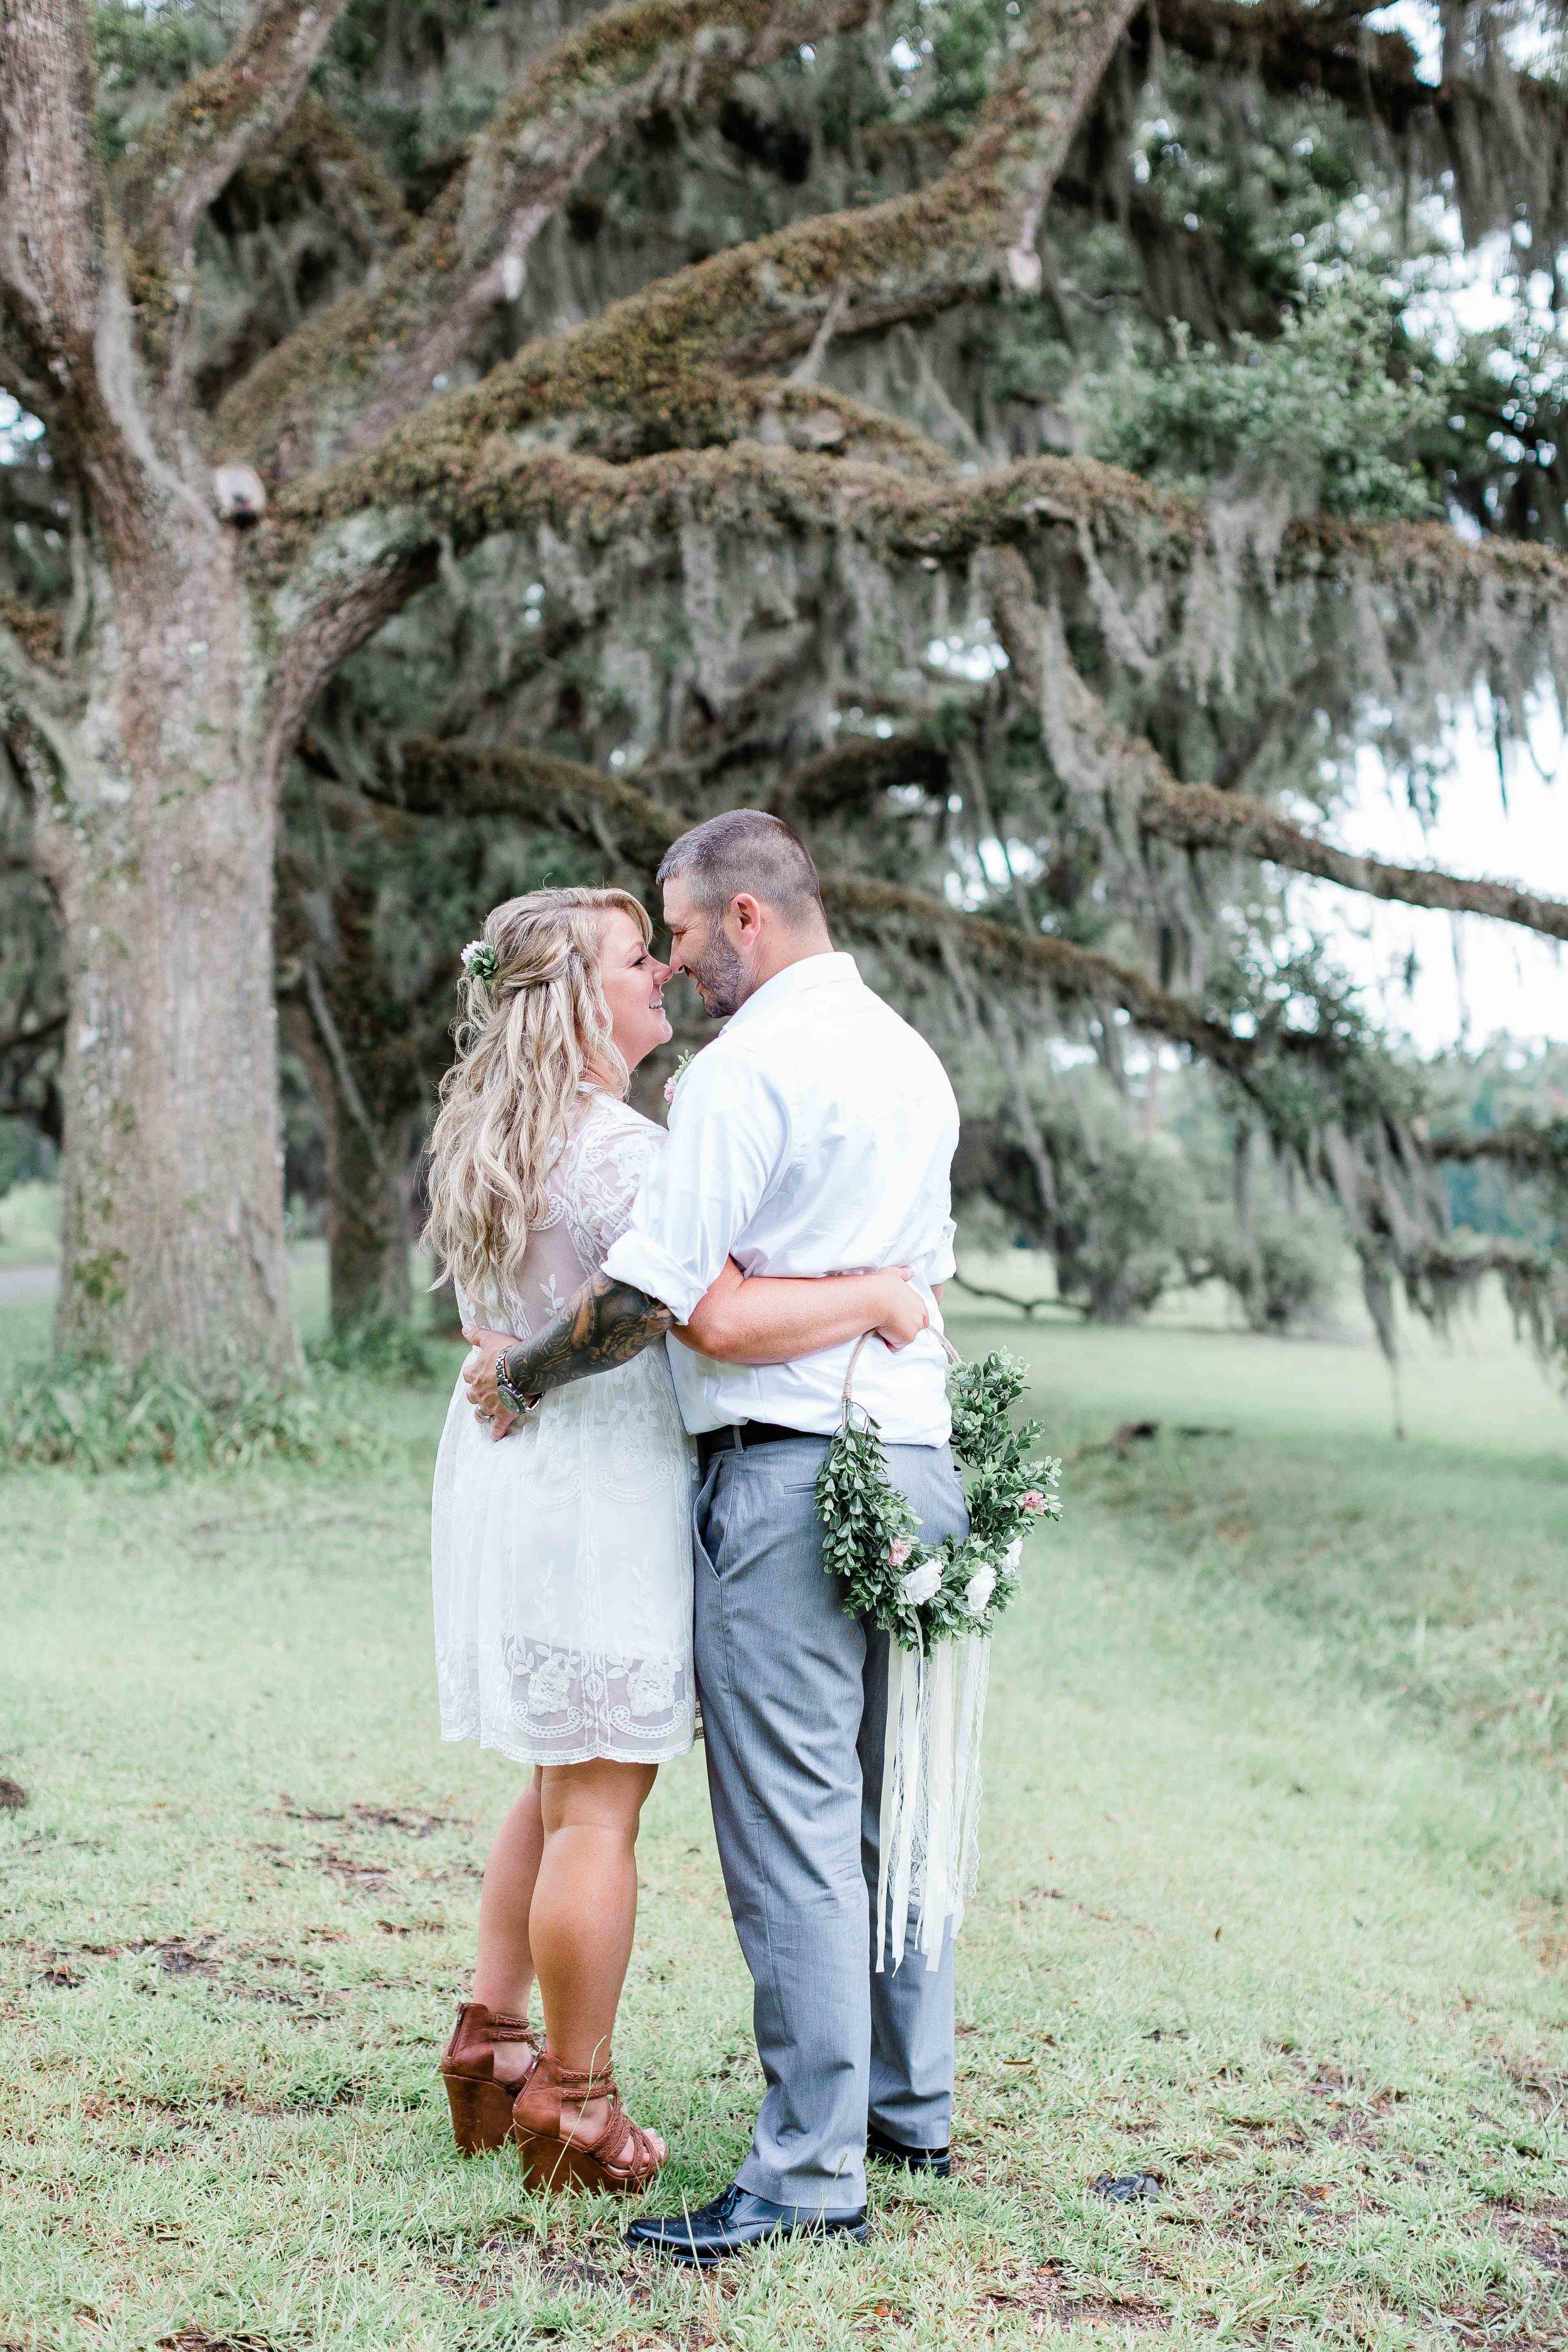 20190727Georgia-Wormlsoe Plantation-Simply Eloped-Savannah Wedding Photographer- Southern Lens Photography11.jpg